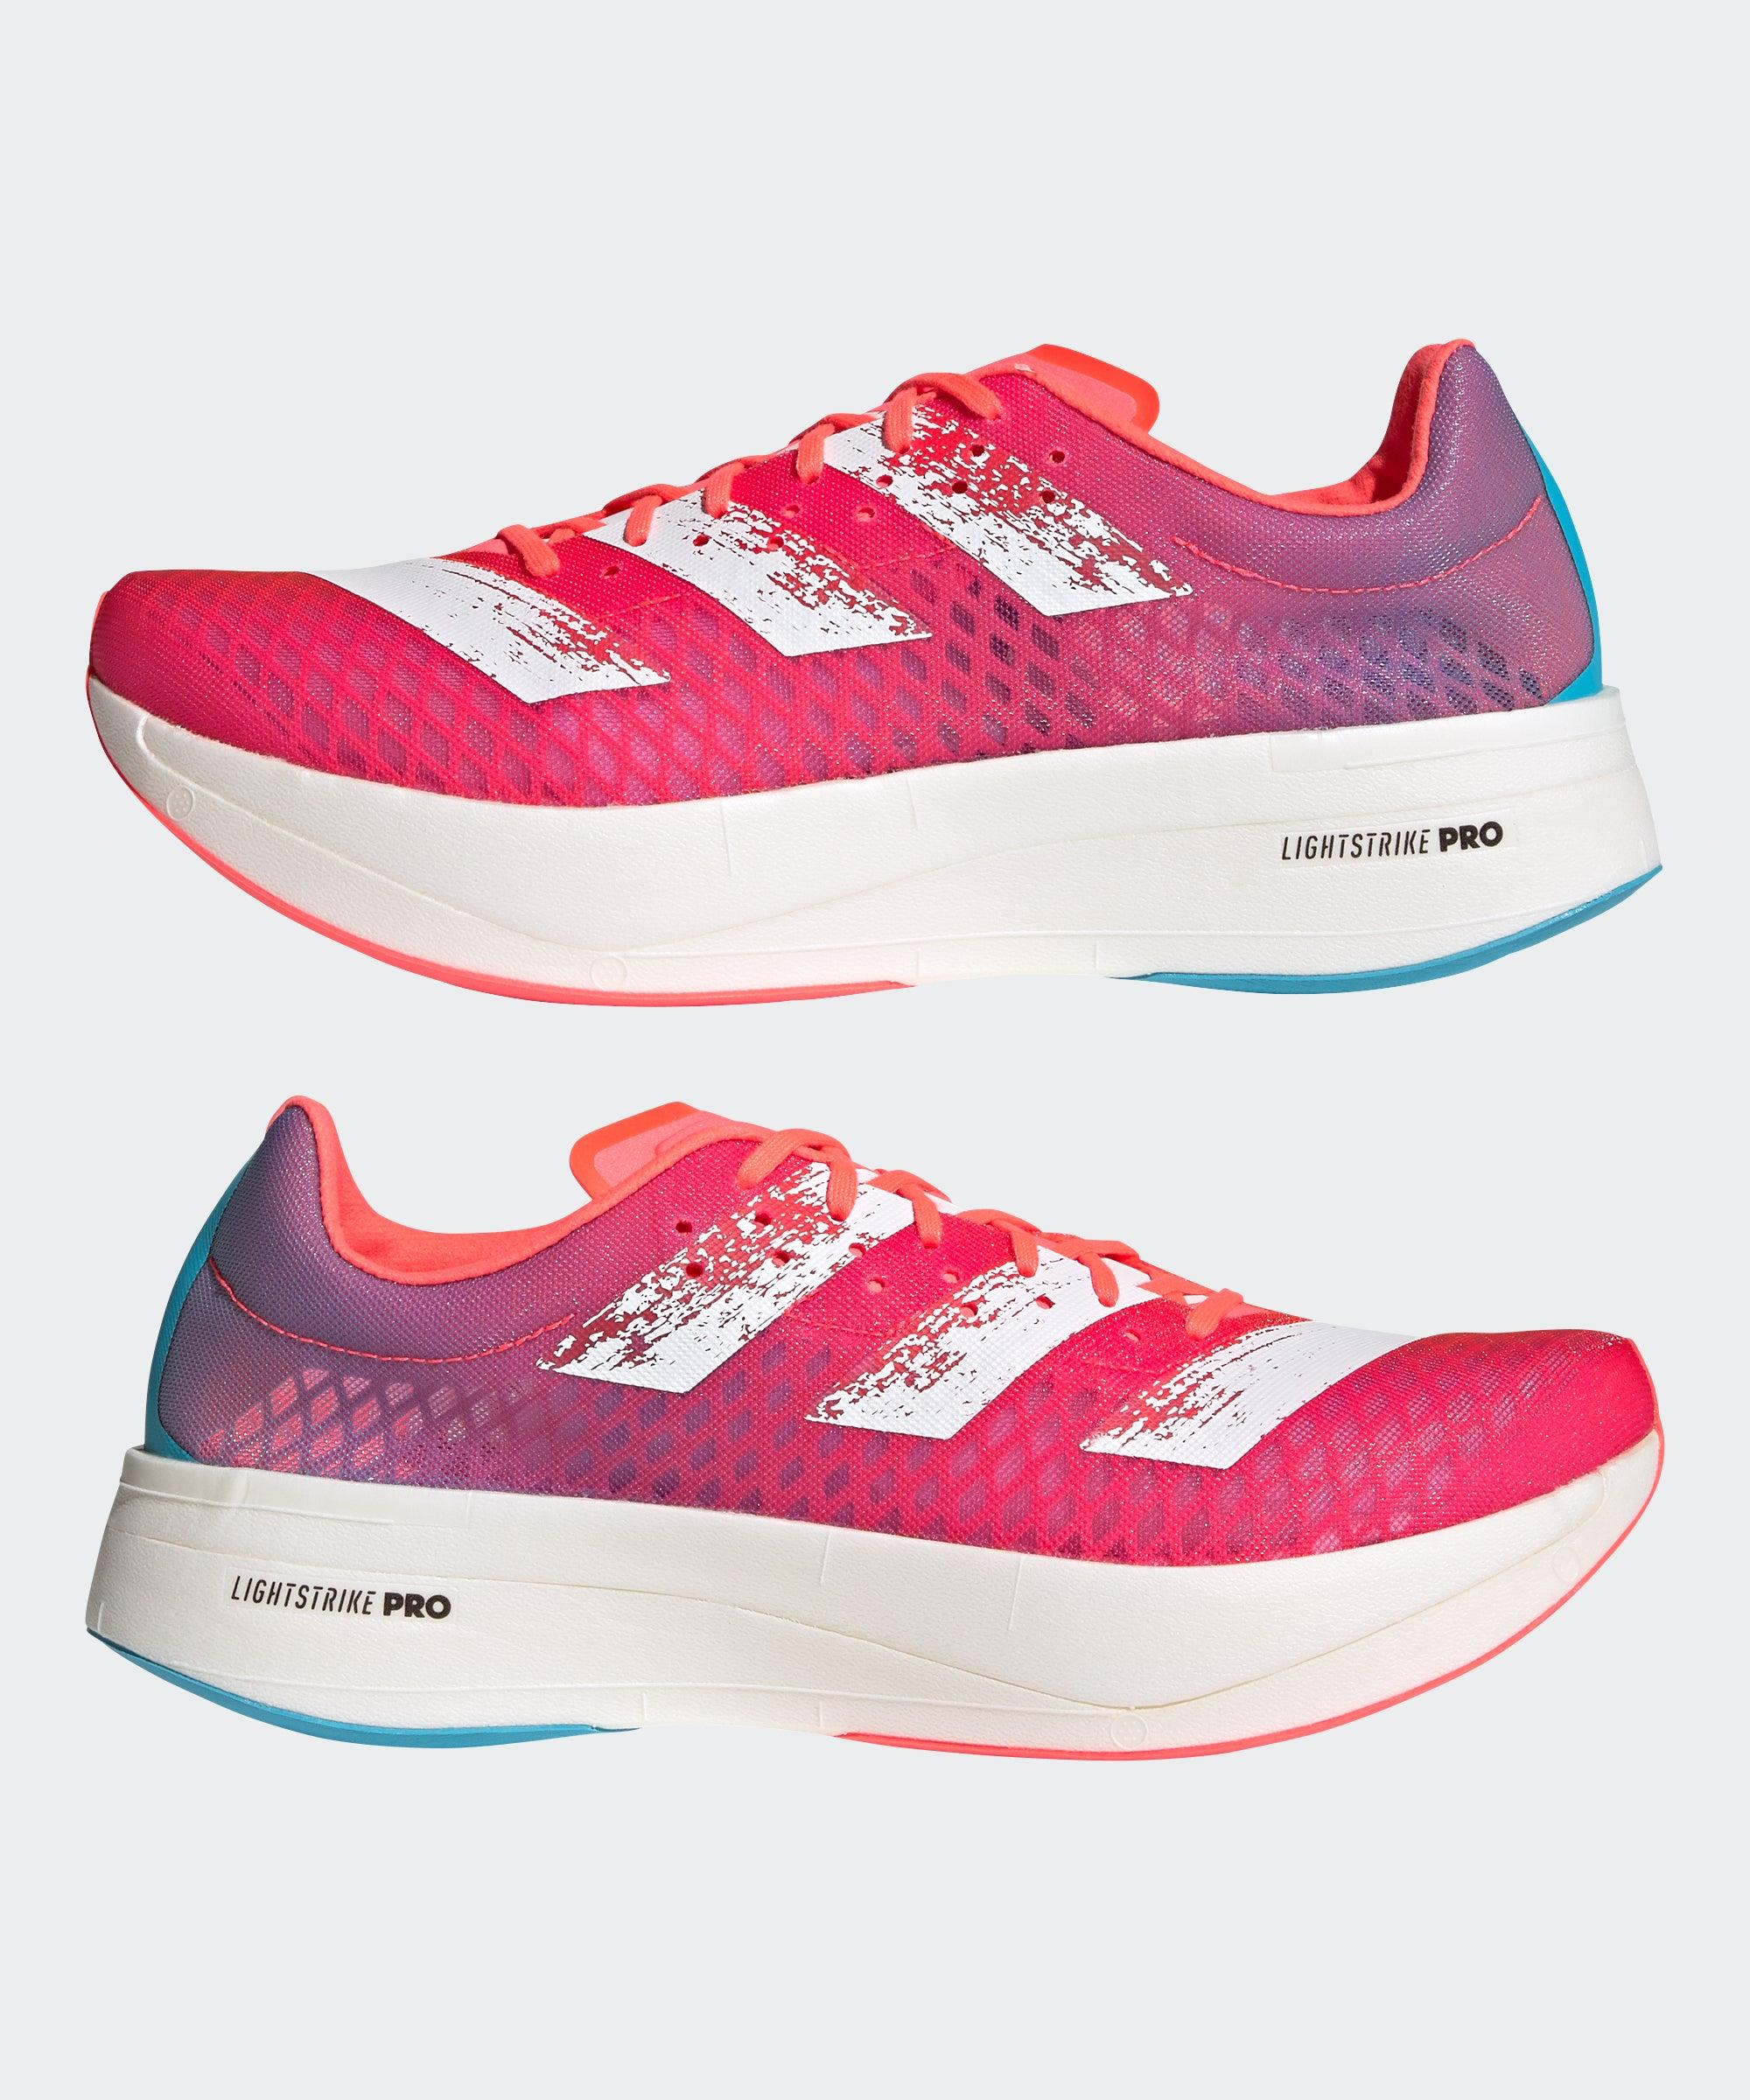 Tried Adidas Adizero Adios Pro Running Shoe